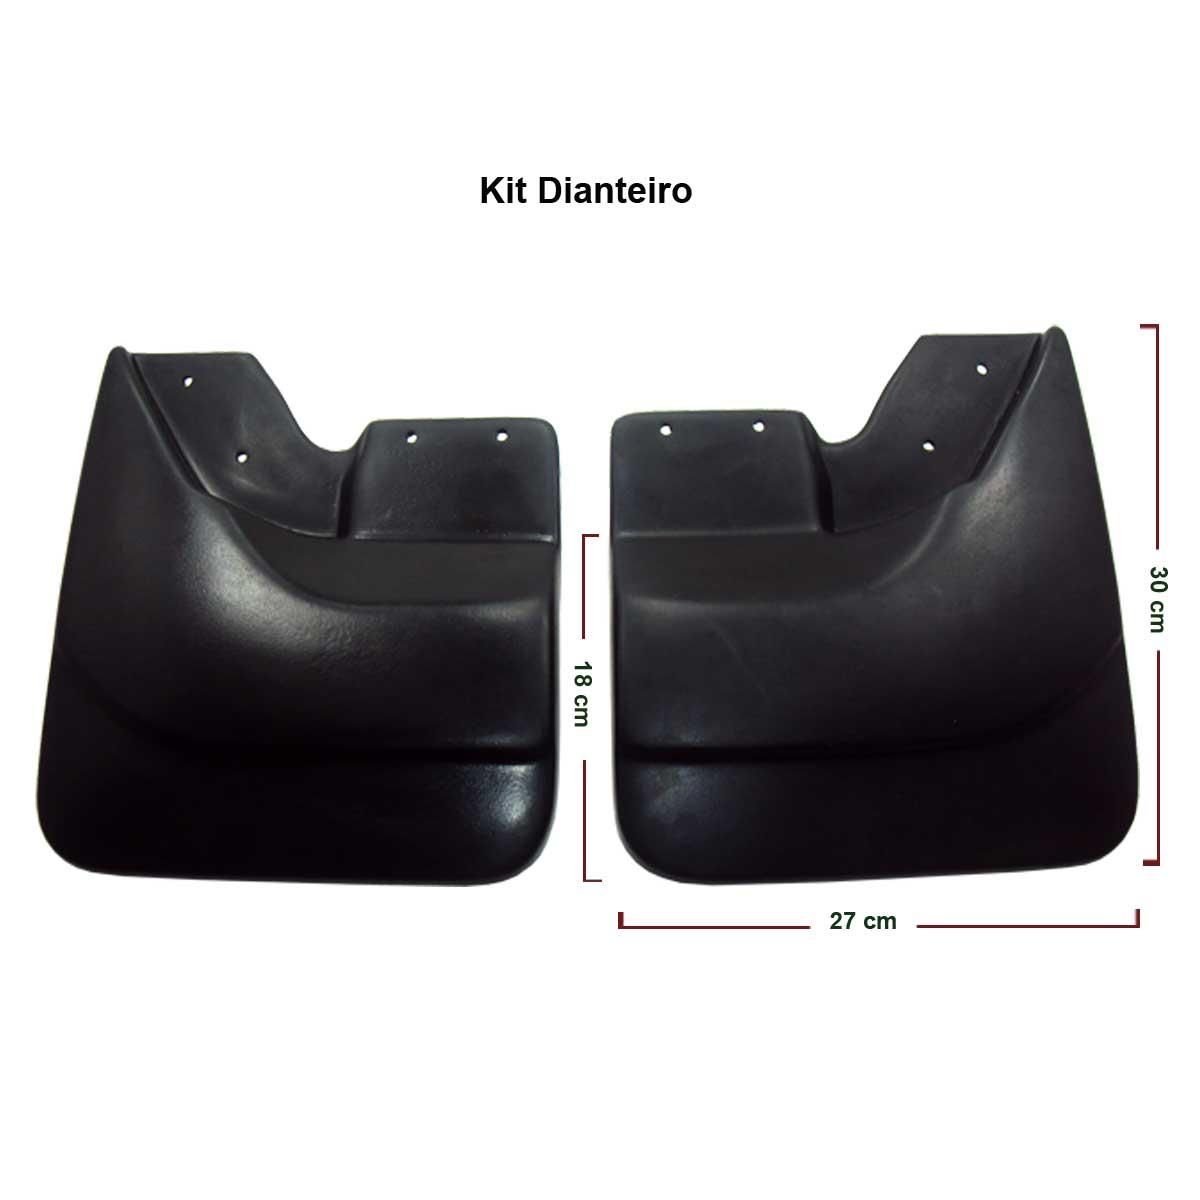 Apara barro lameira Dfender S10 1995 a 2011 sem alargador de paralama